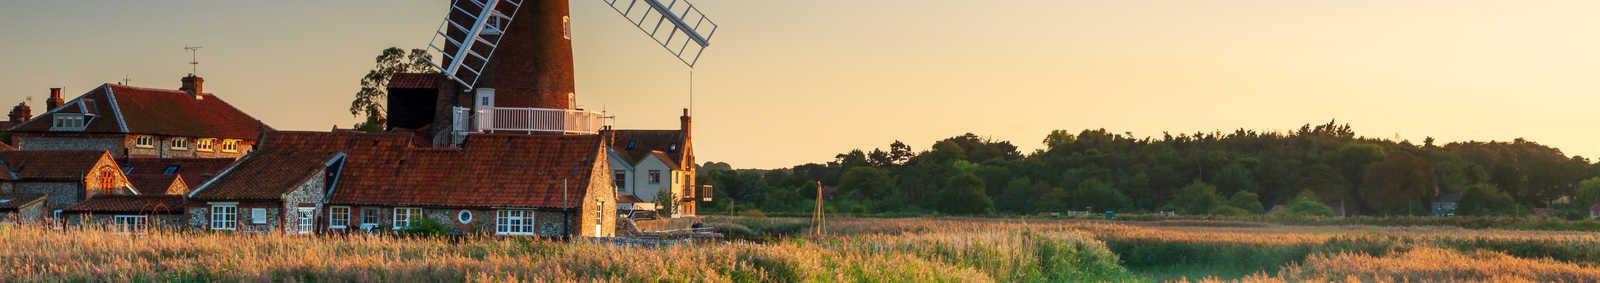 Cley - windmill